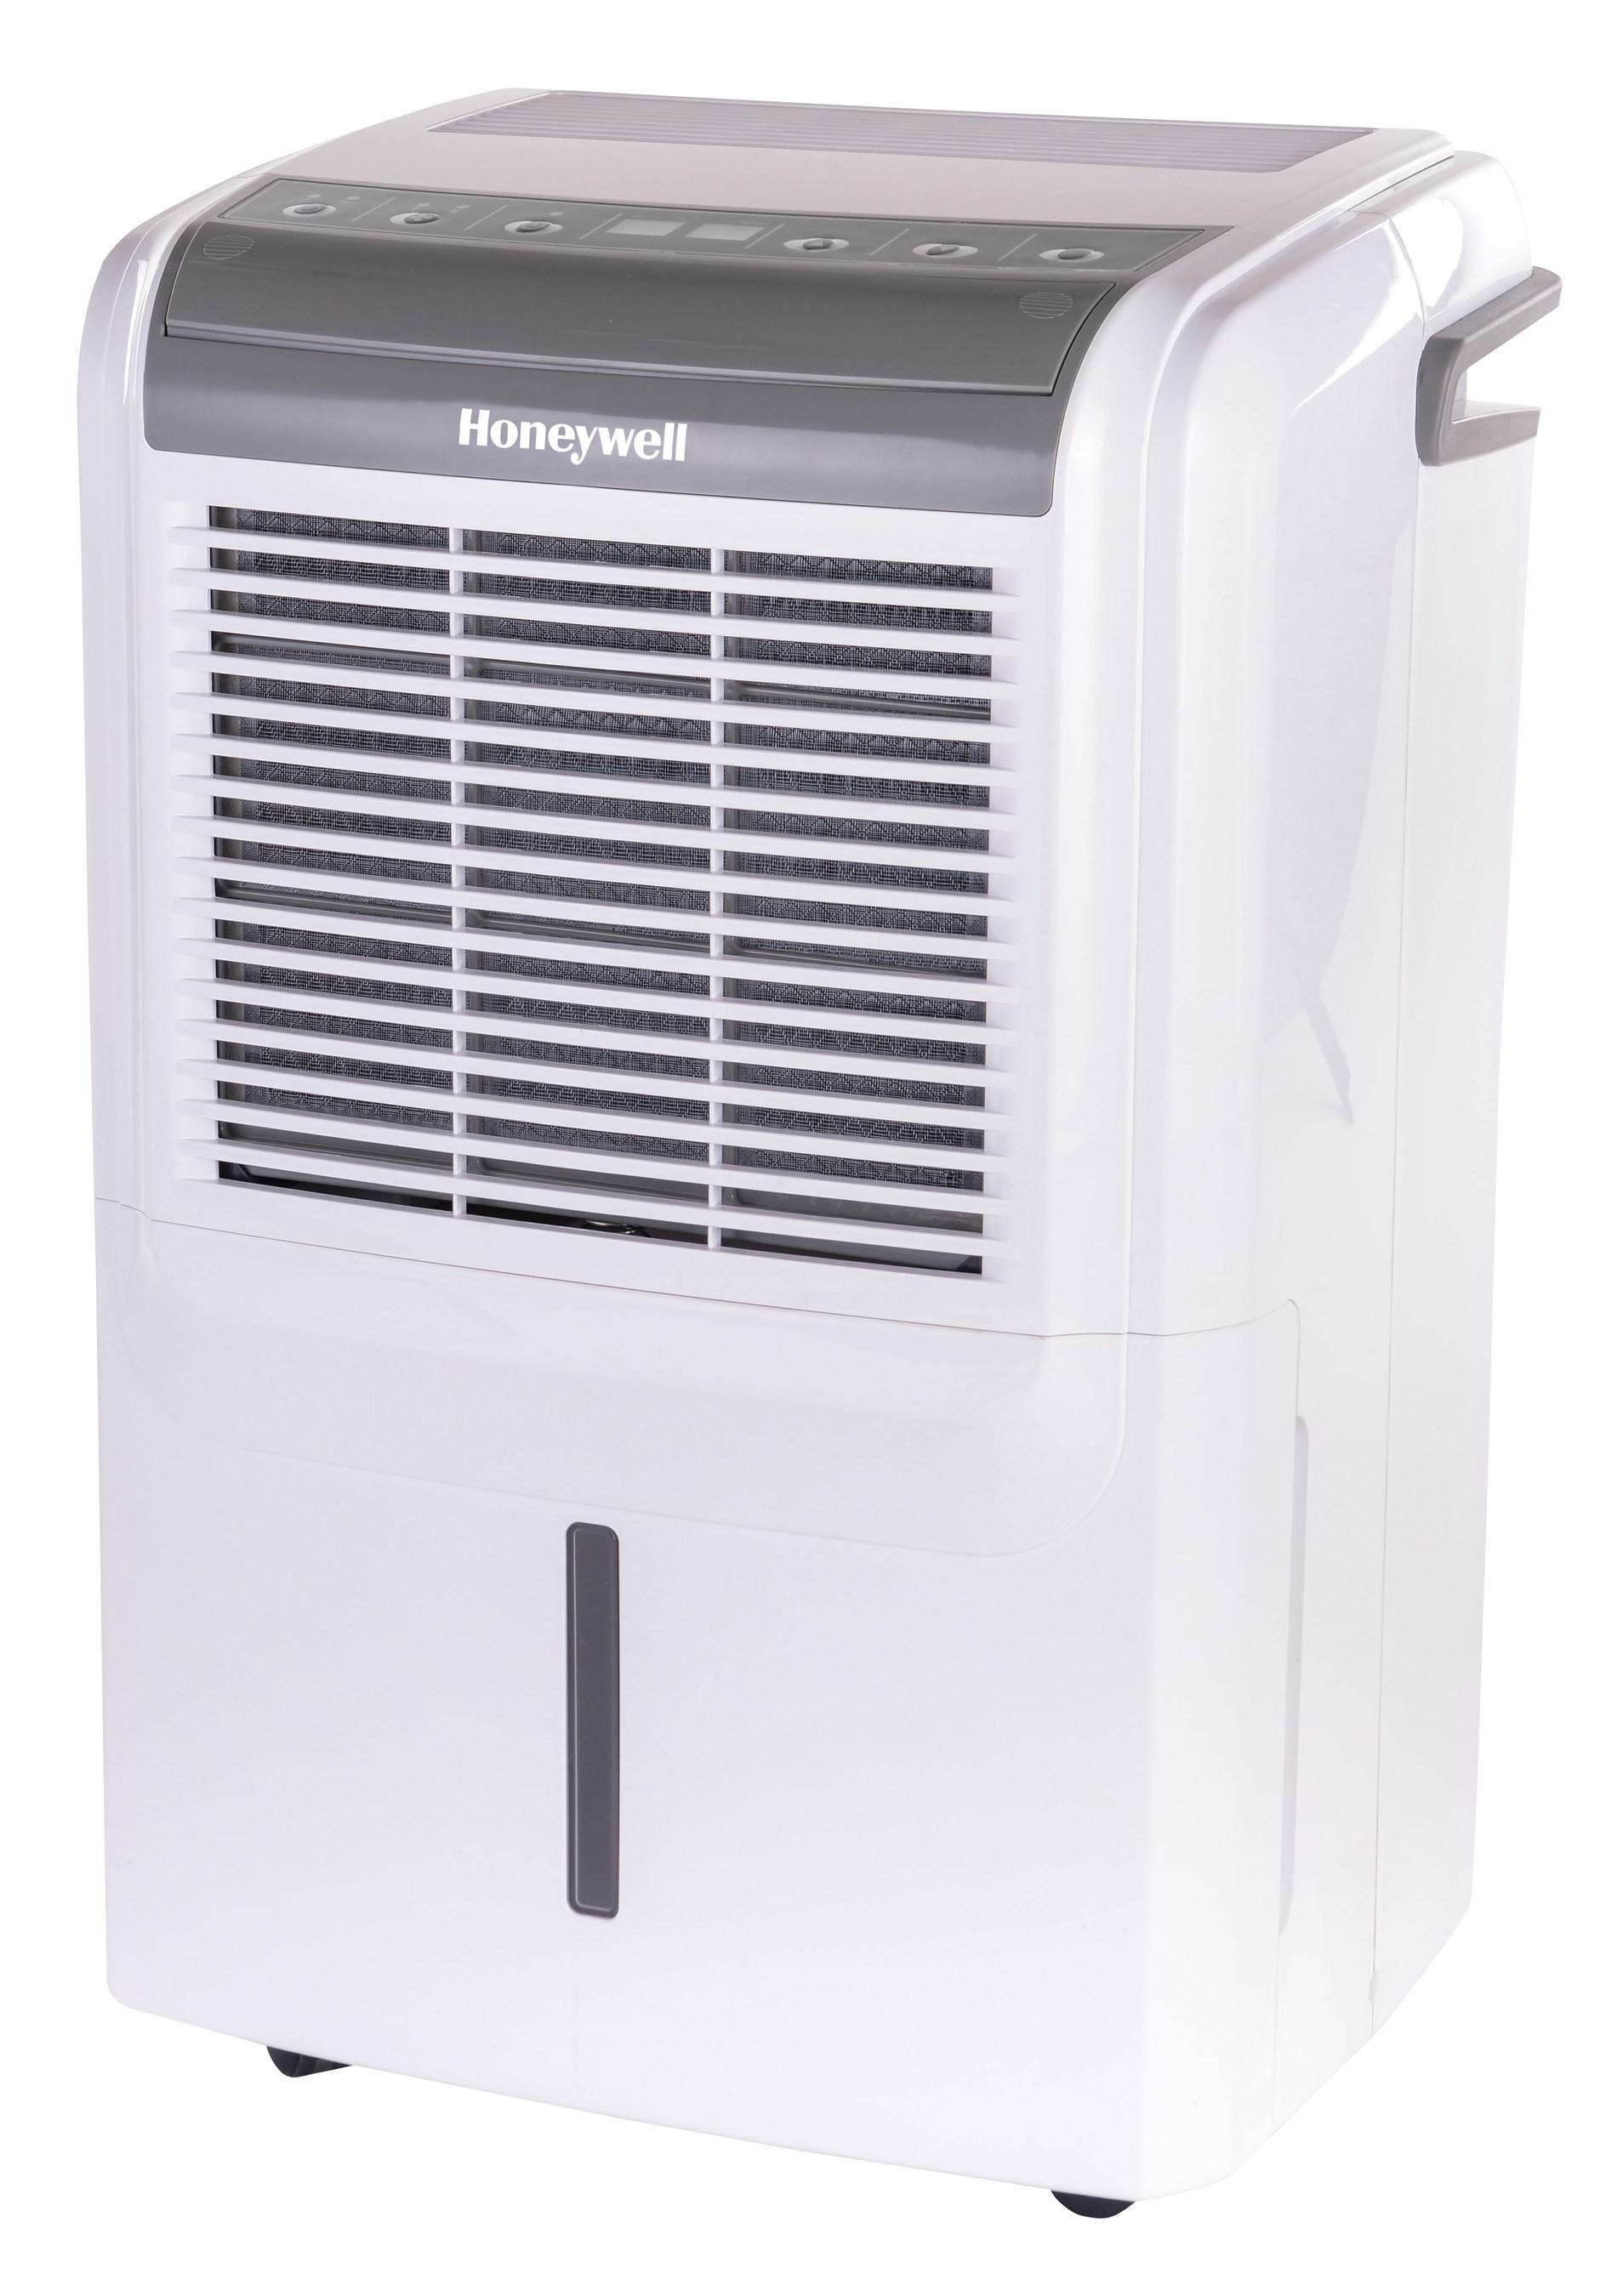 Honeywell DH70W 70-Pint Dehumidifier